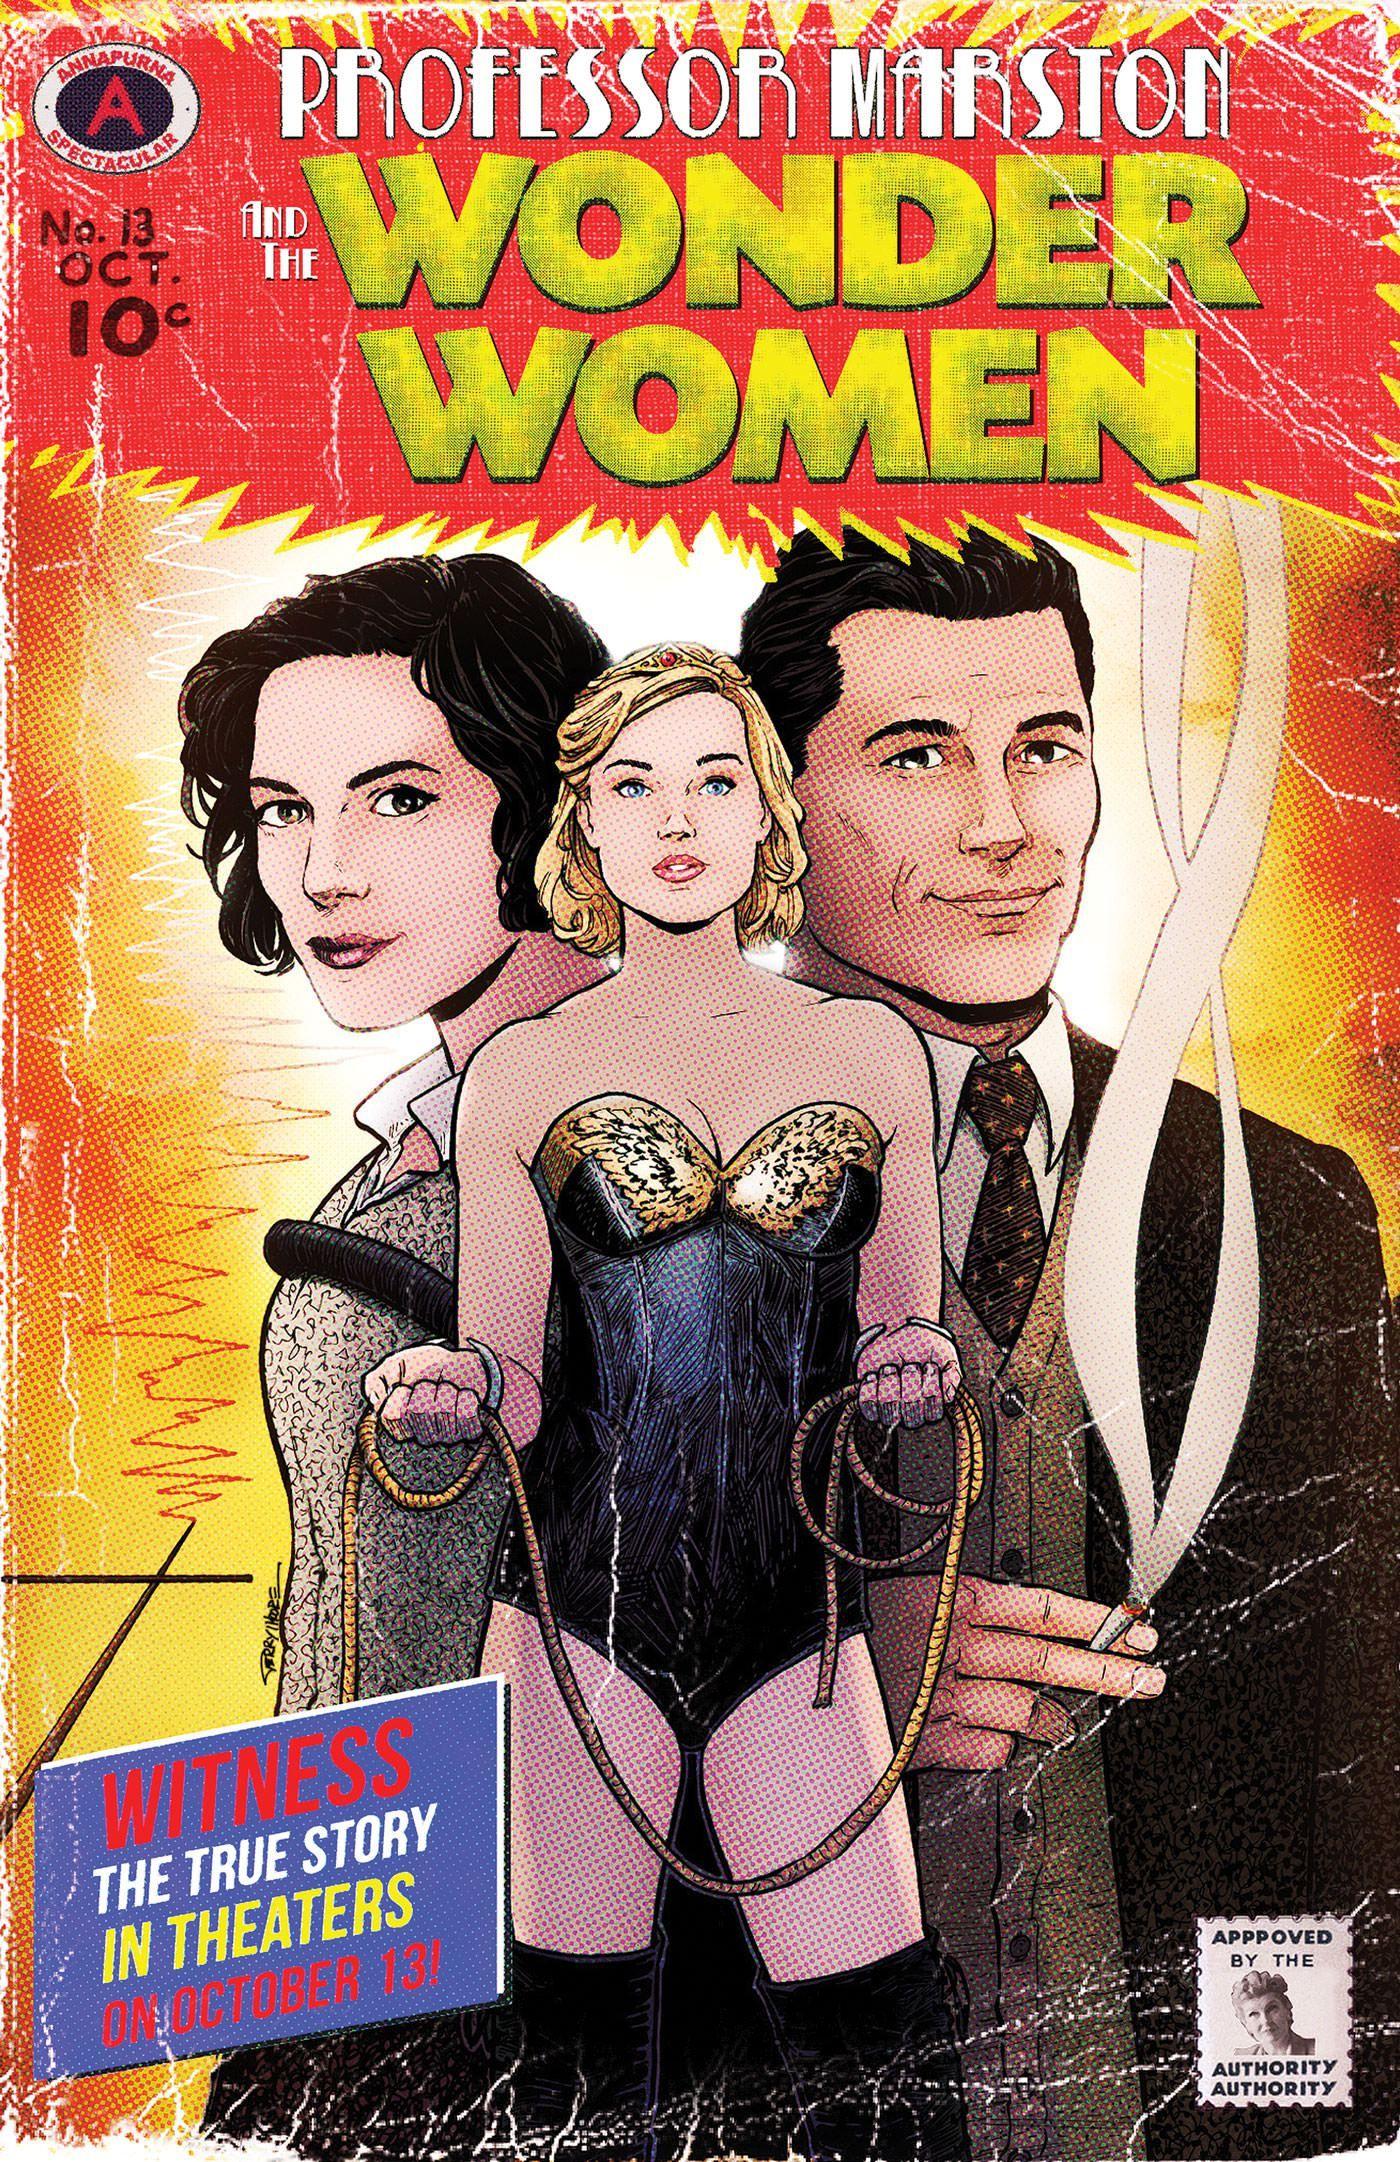 Season Film Festival: Professor Marston and The Wonder Women